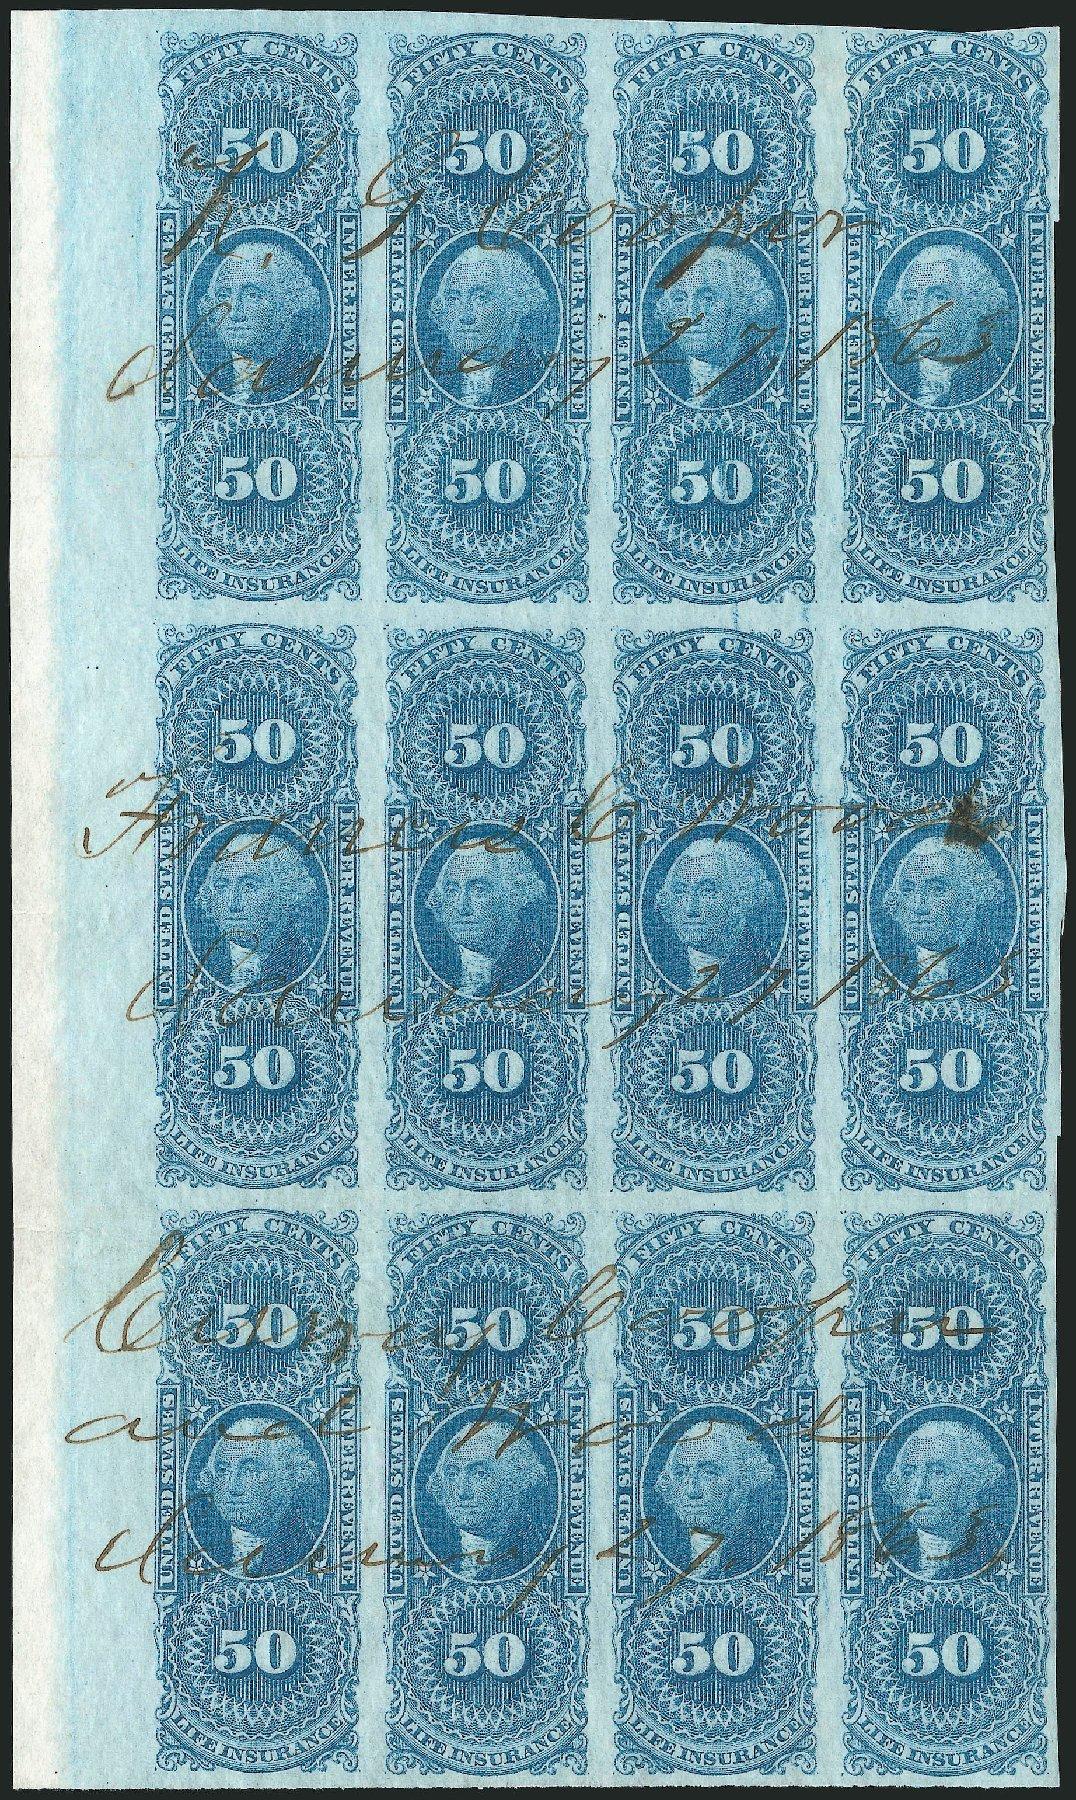 US Stamp Value Scott Cat. #R58 - 1862 50c Revenue Life Insurance. Robert Siegel Auction Galleries, Dec 2014, Sale 1089, Lot 345